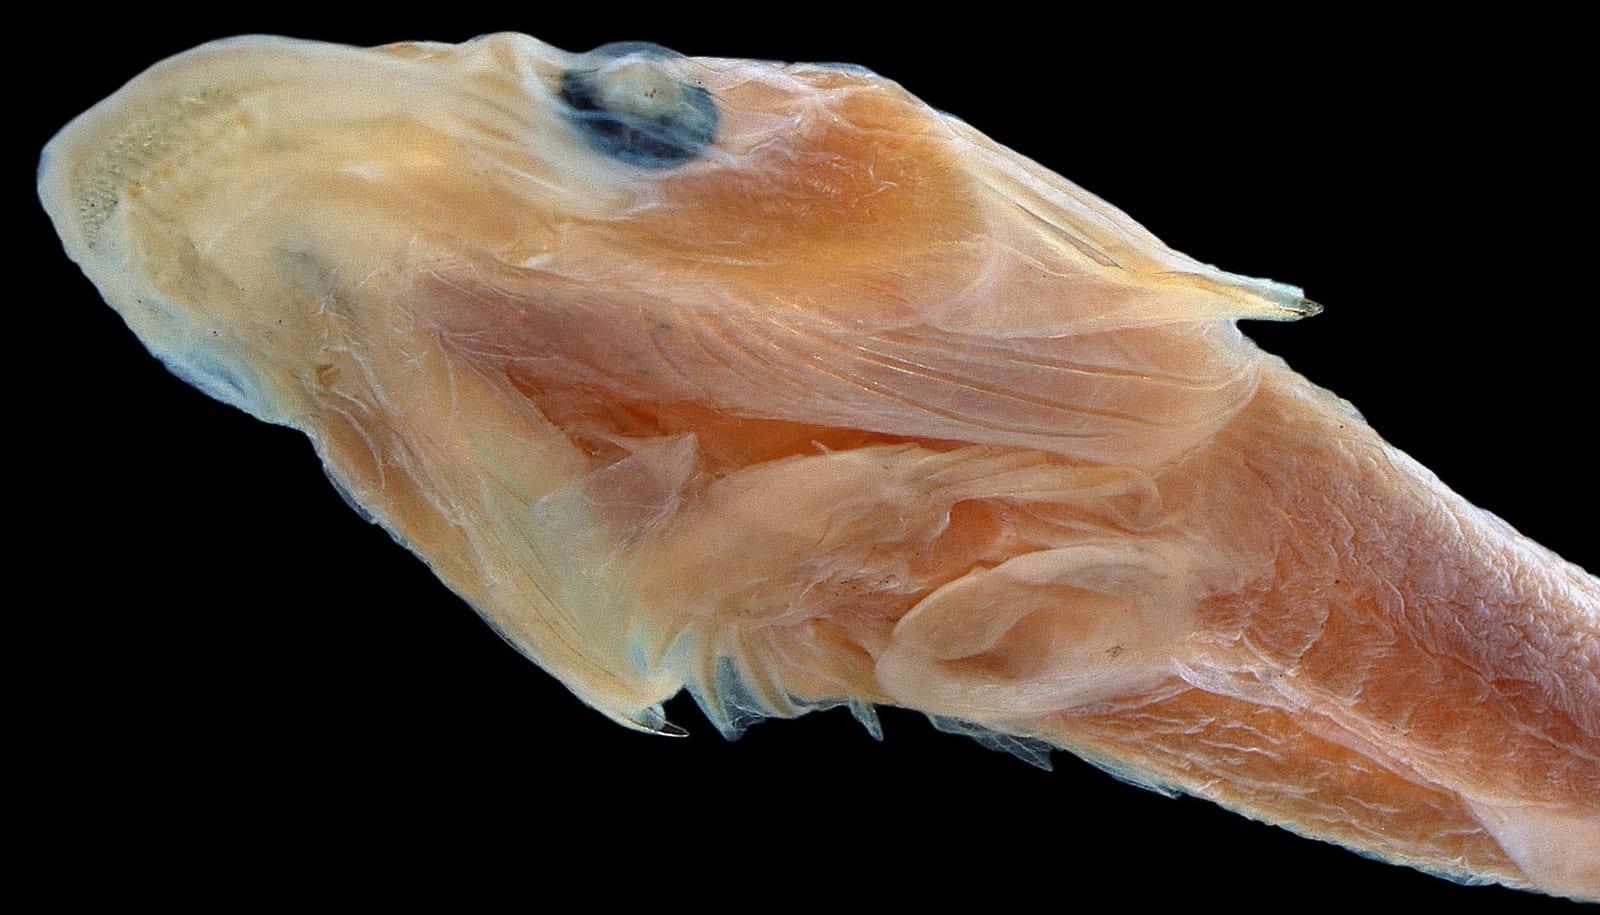 duckbilled clingfish head